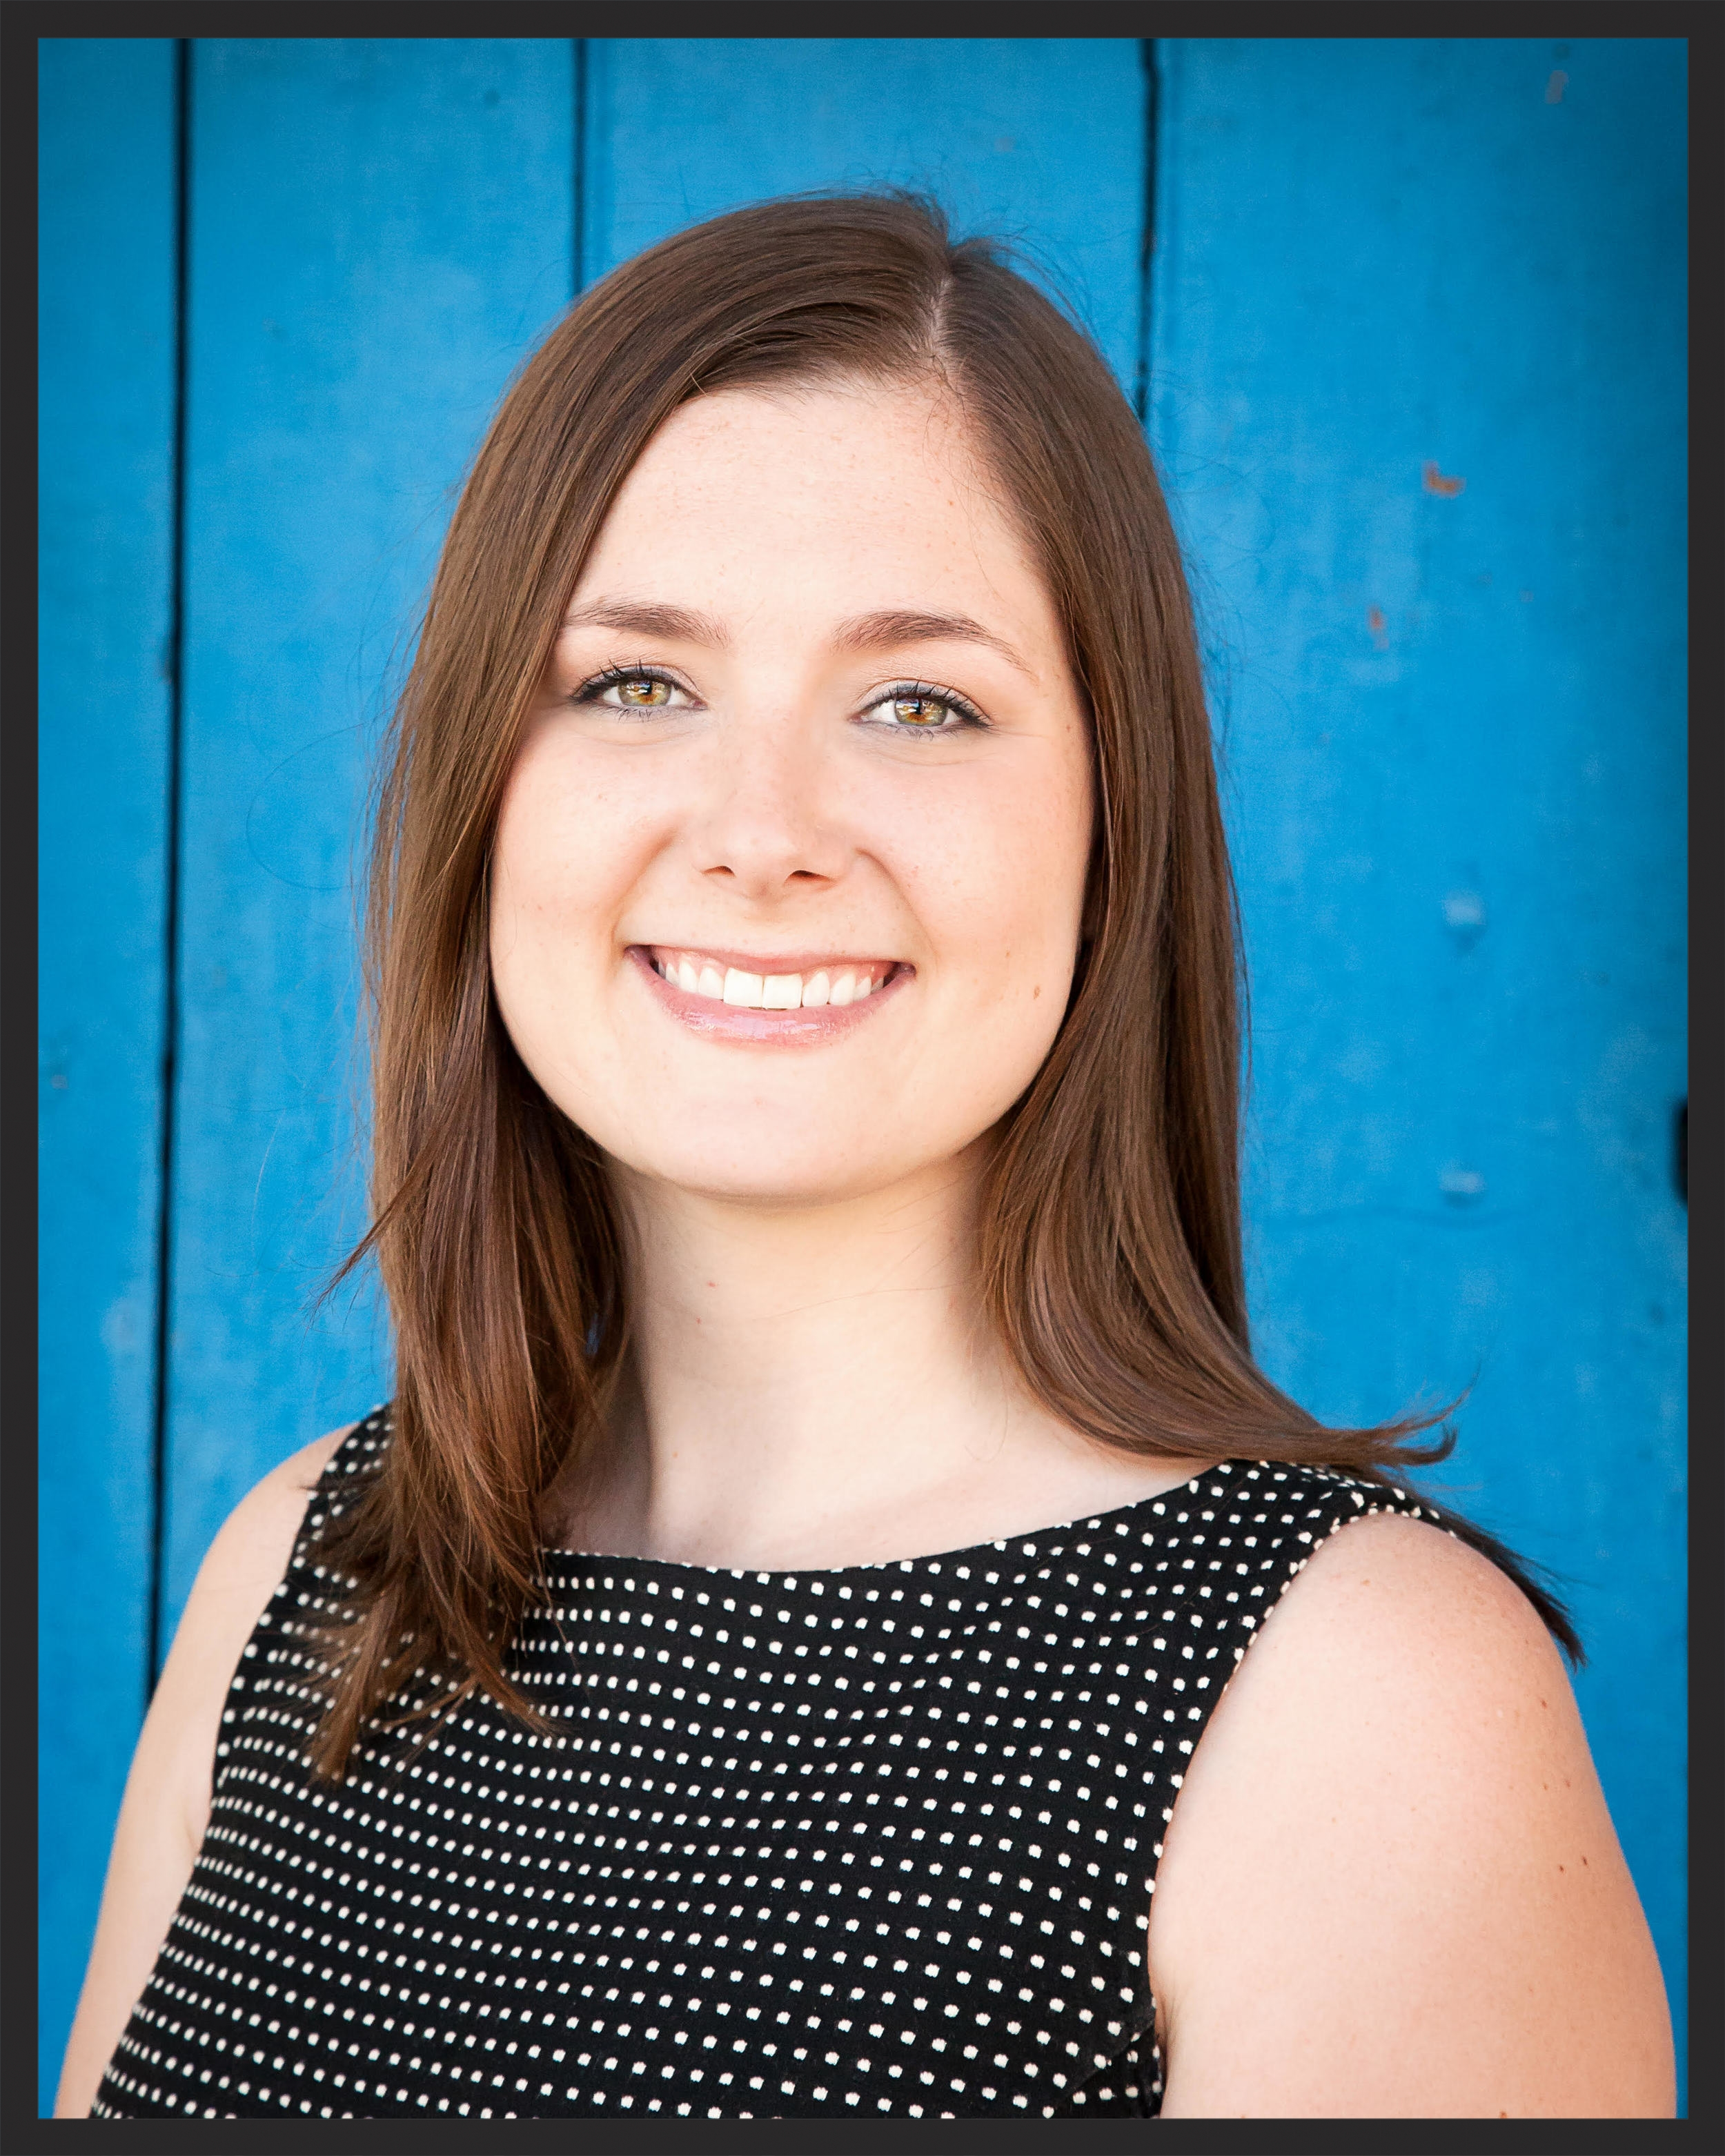 Megan Gouzy - Events Specialist